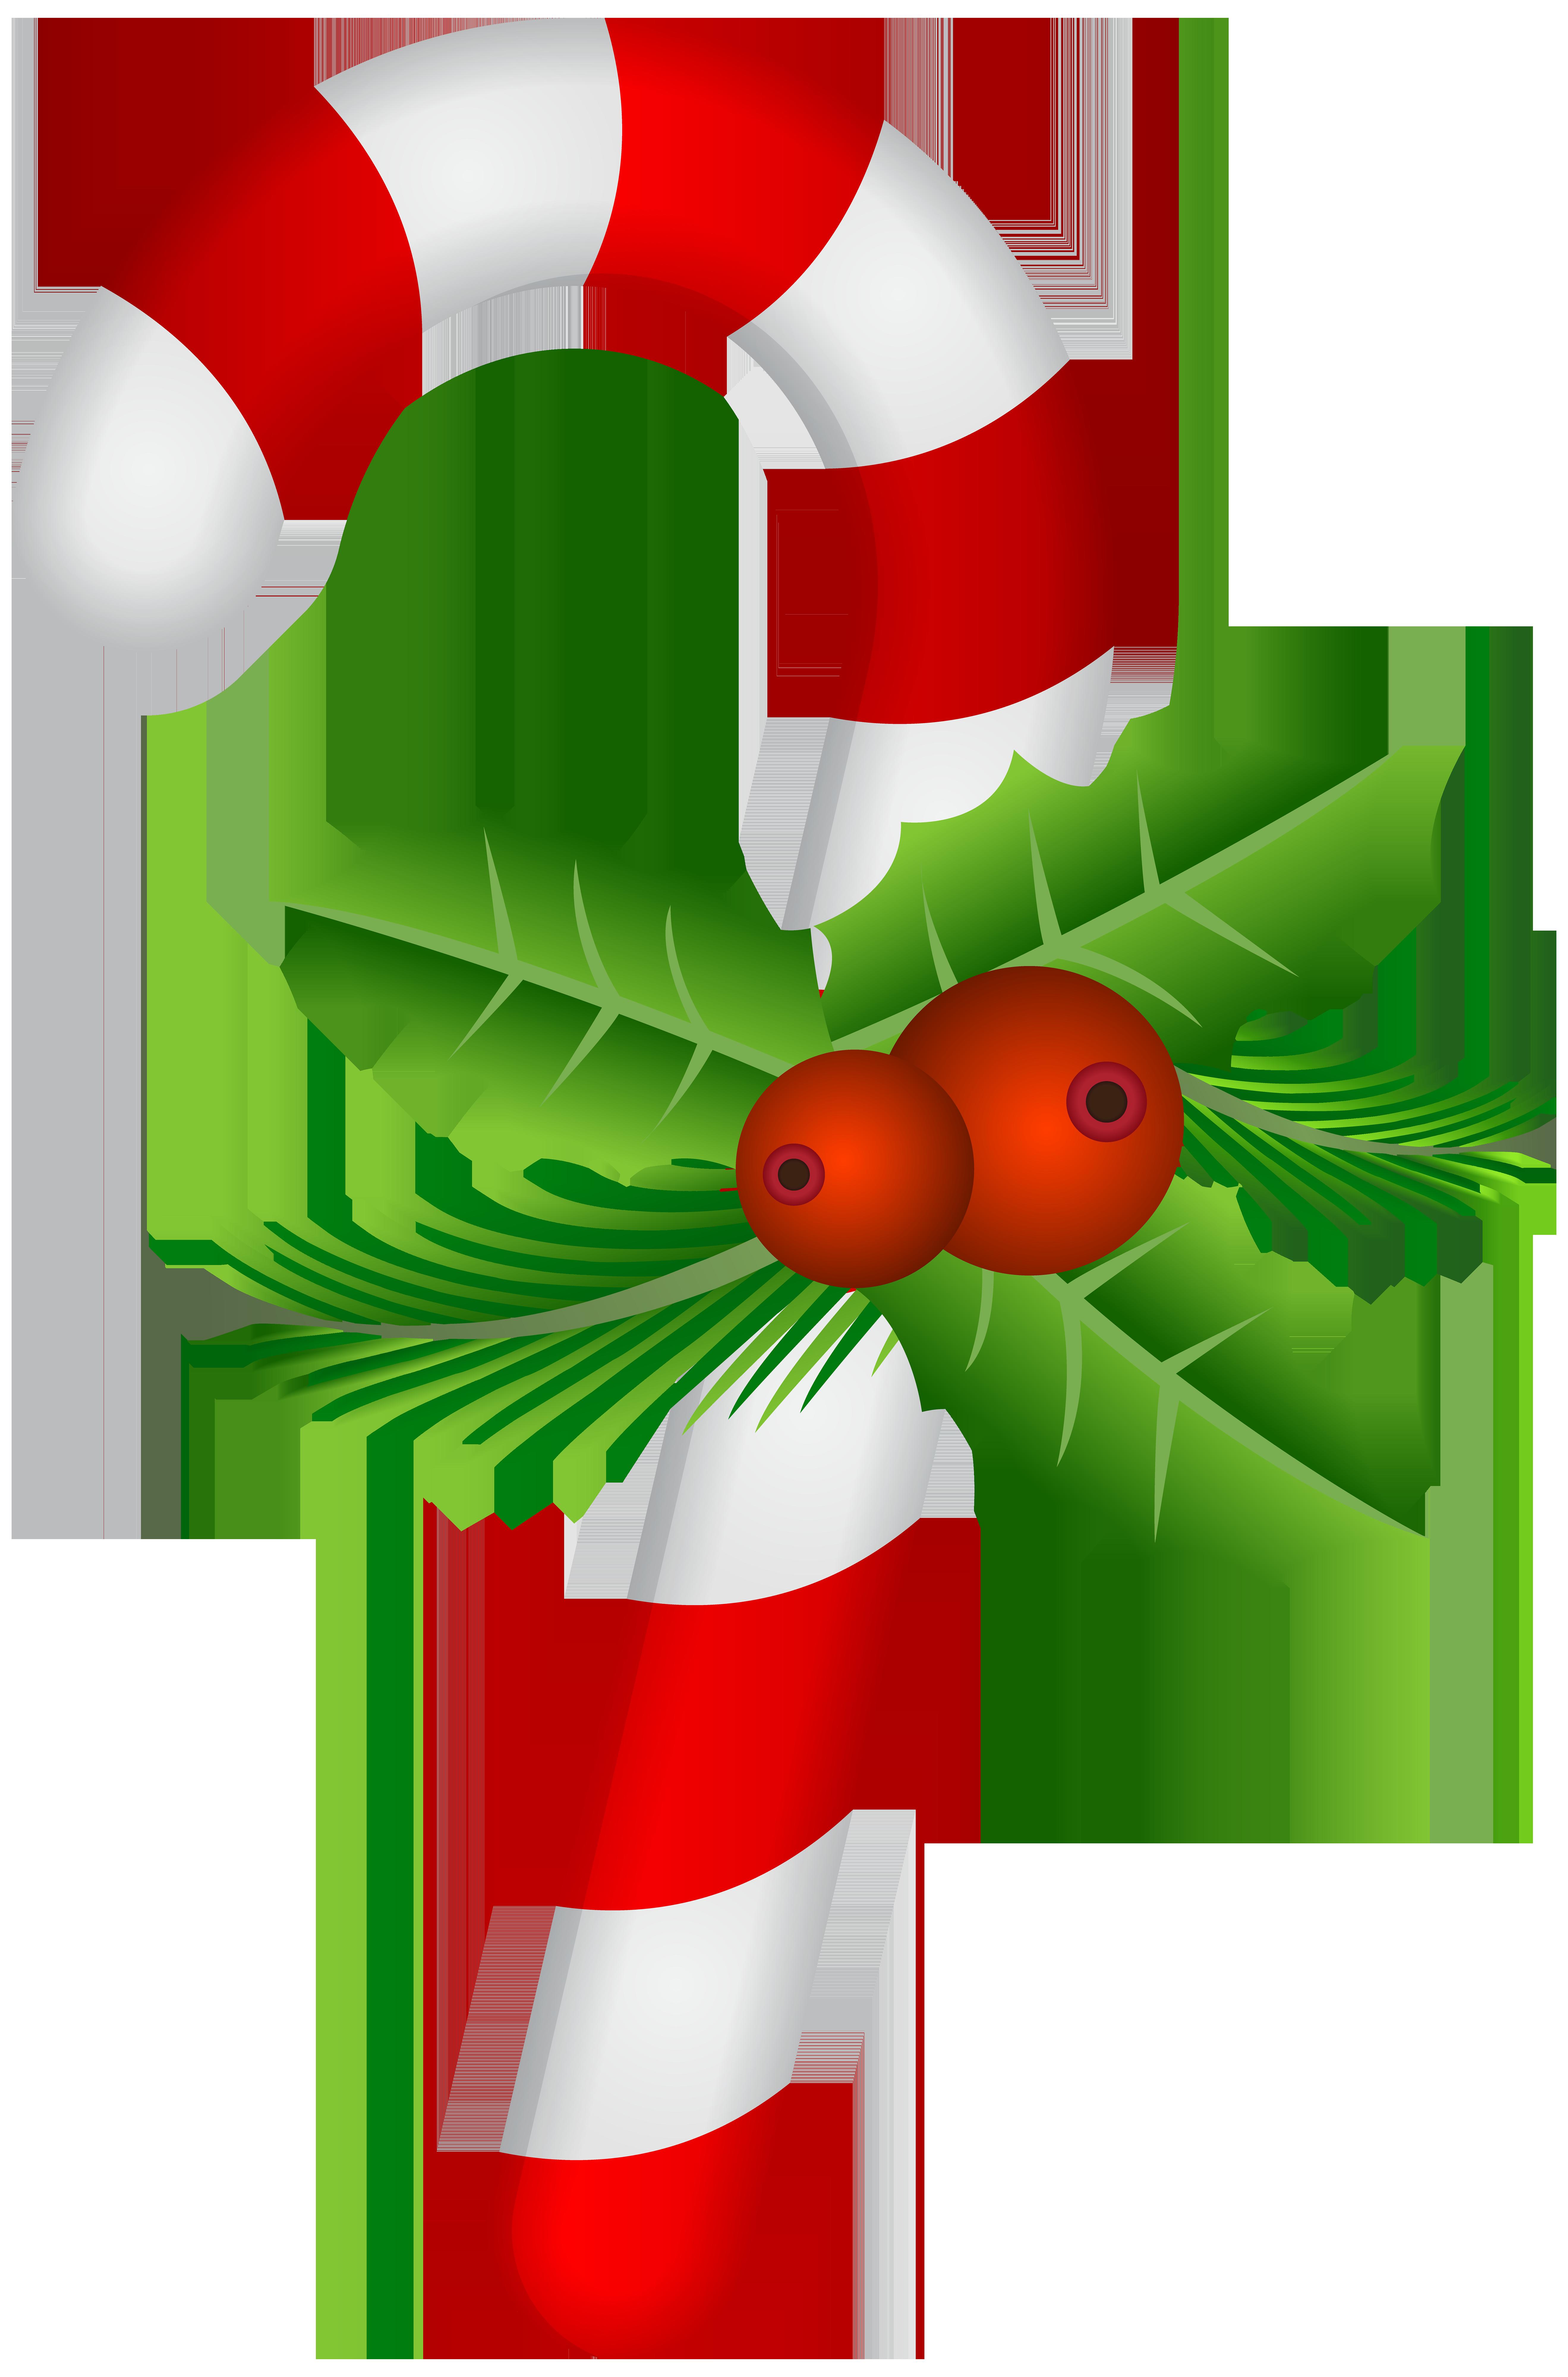 Pin by Asya Ilieva on Christmas ideas.